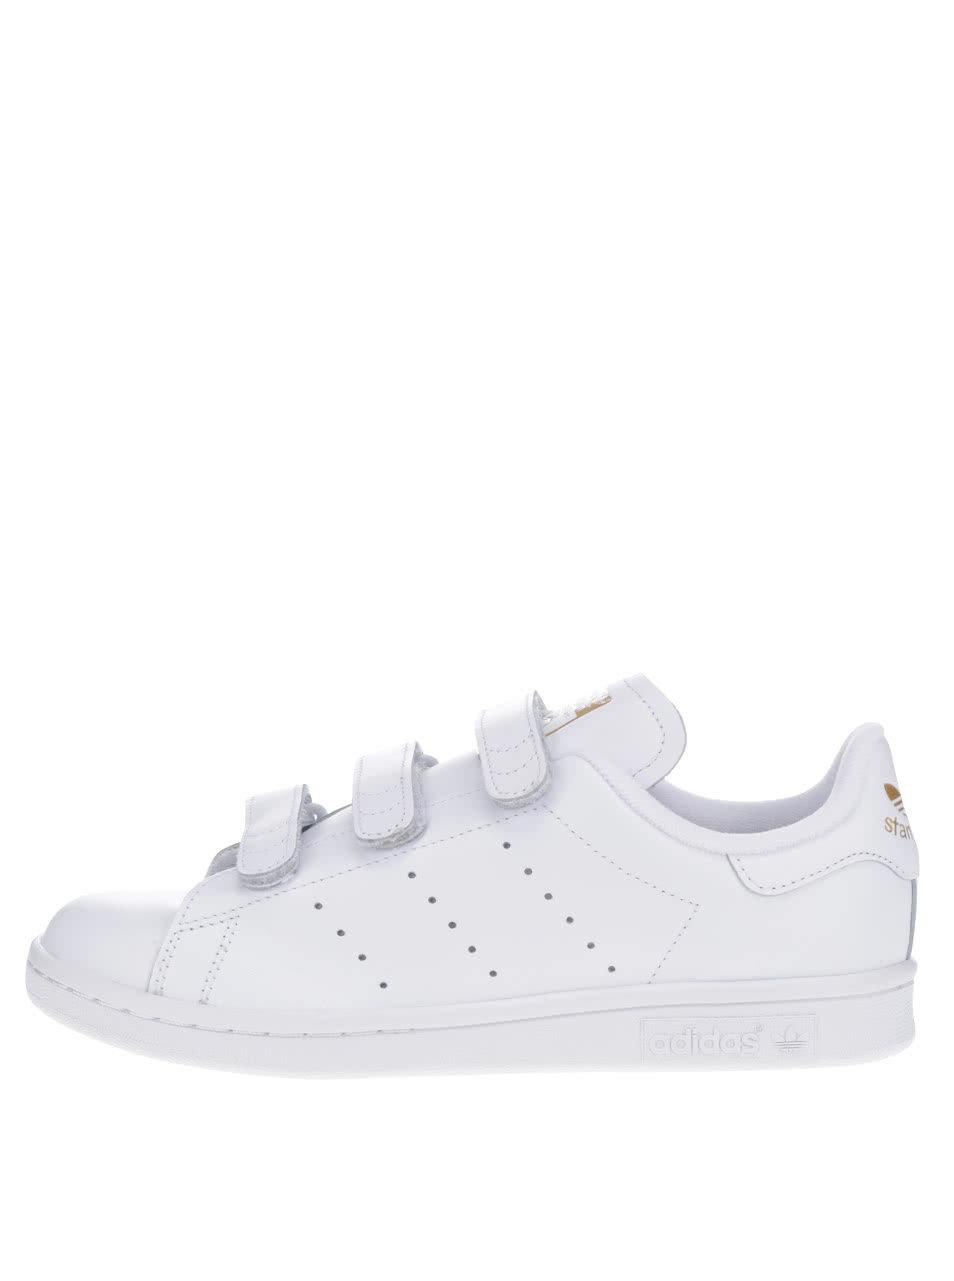 Bílé dámské kožené tenisky s detaily adidas Originals Stan Smith ... 507e2d822b